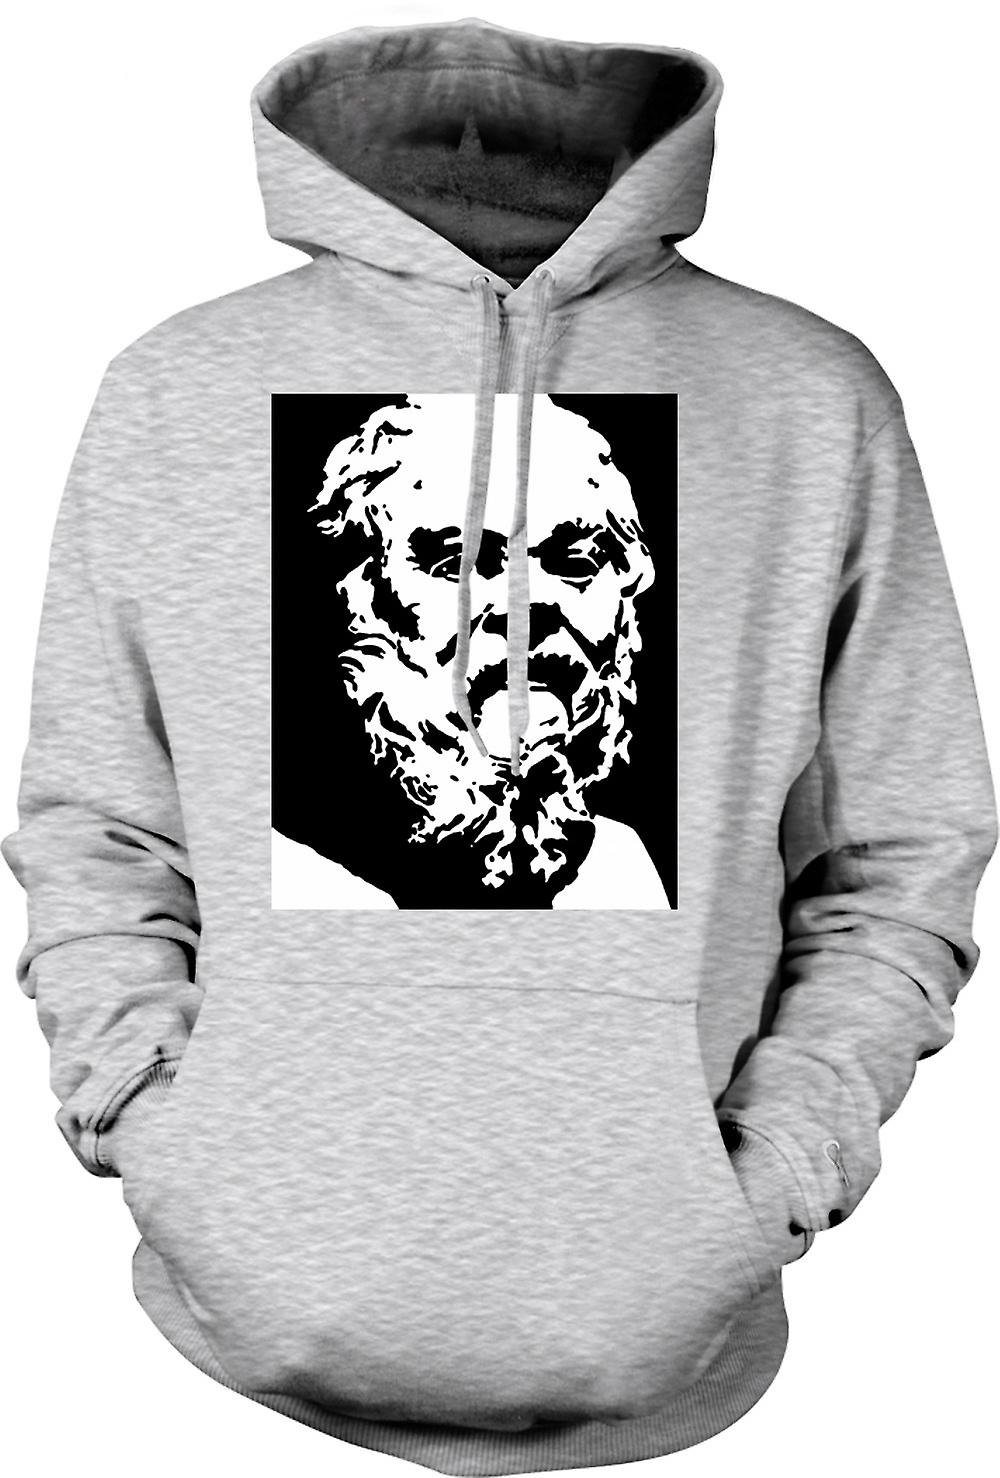 Para hombre con capucha - Sócrates - icono de plantilla